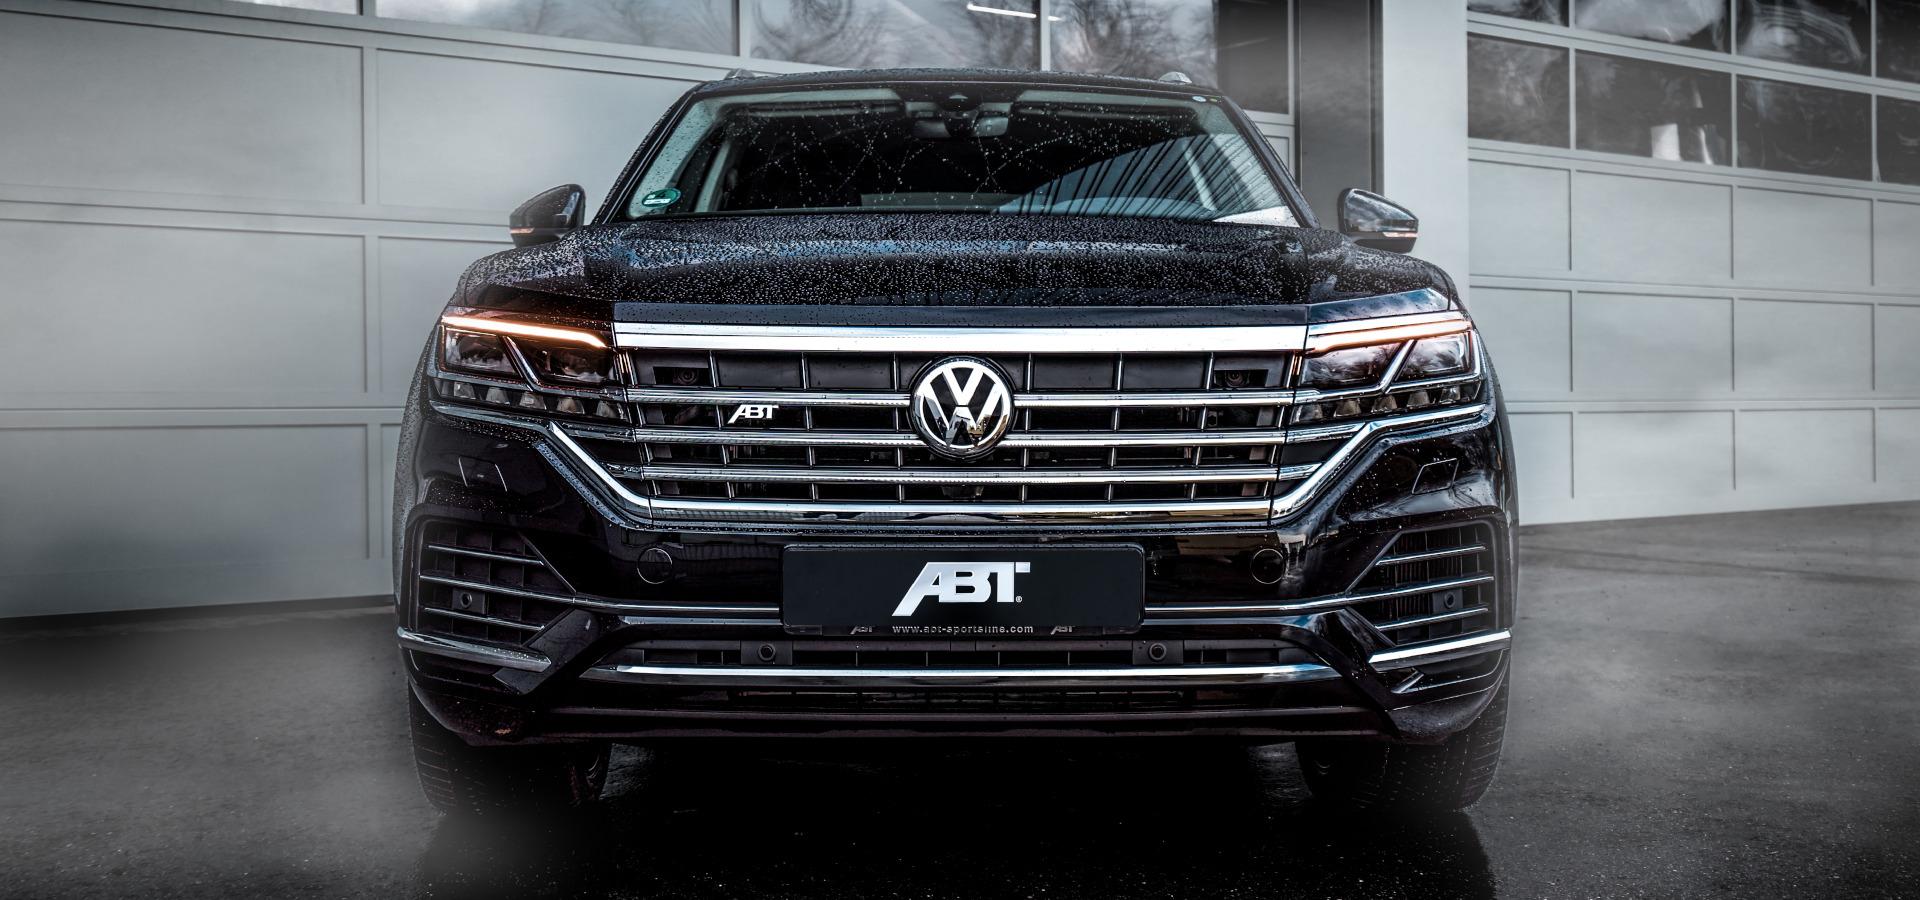 VW Touareg - ABT Sportsline